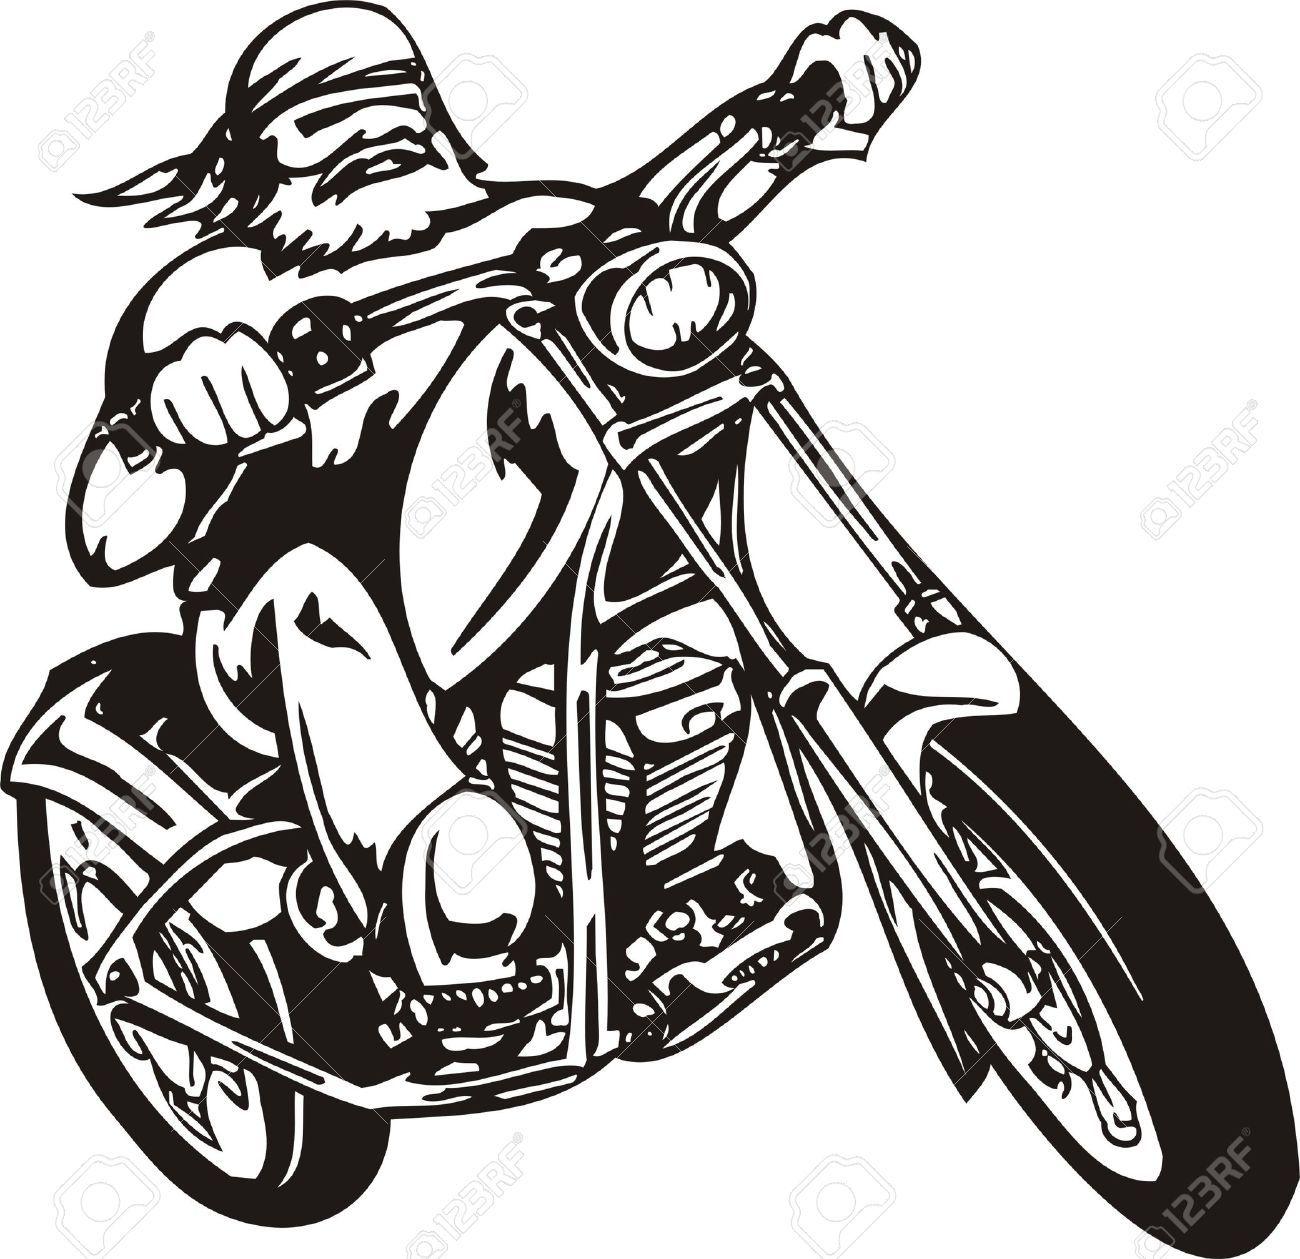 vector biker on motorcycle vector illustration musty rh pinterest com motorcycle vector png motorcycle vector free download